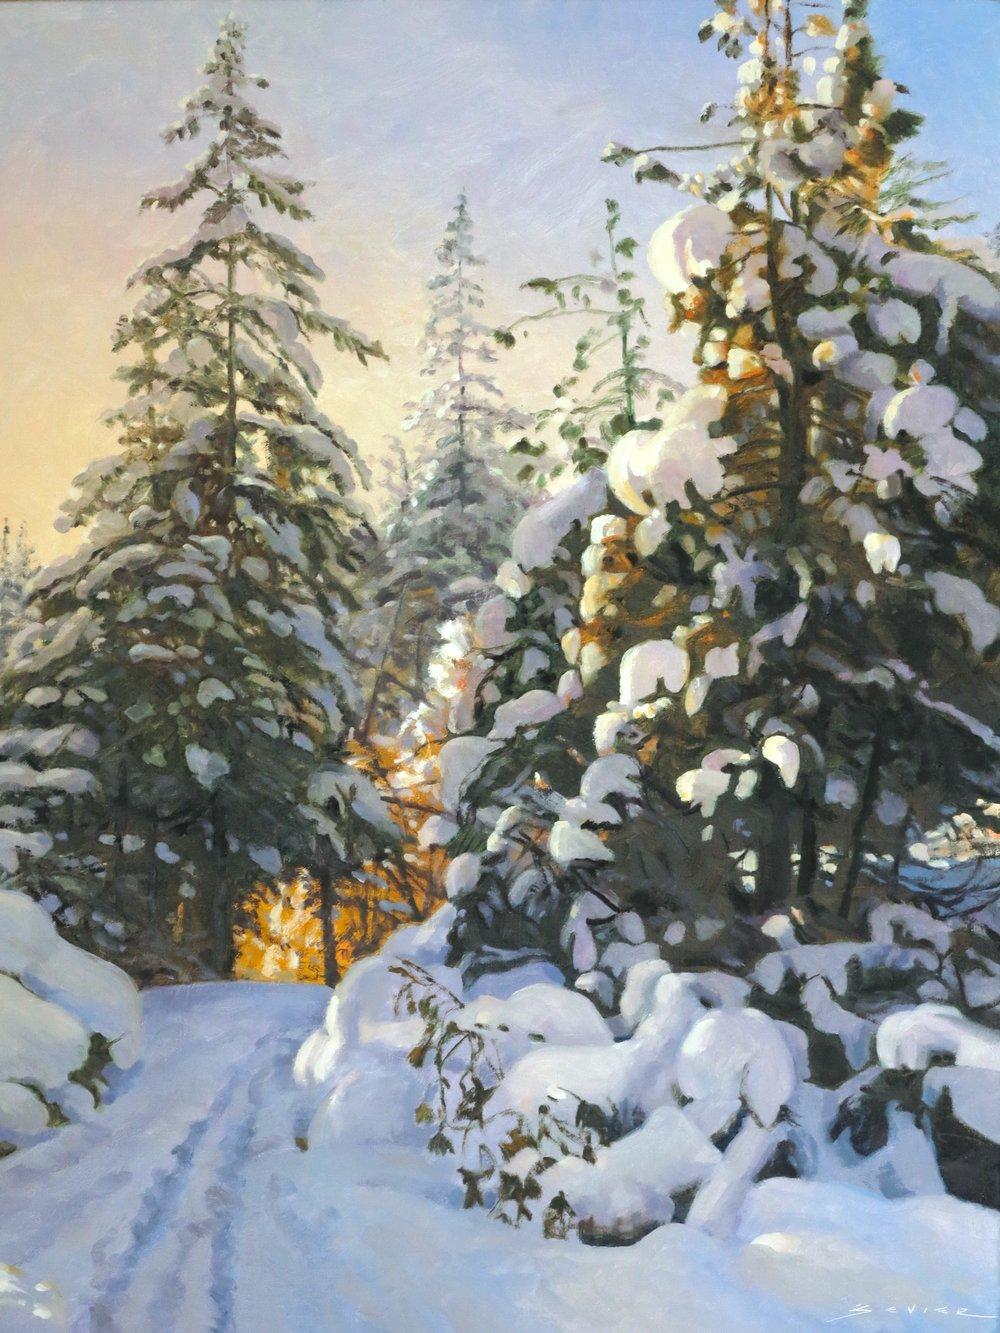 Winter Magic, 25 x 20, Oil